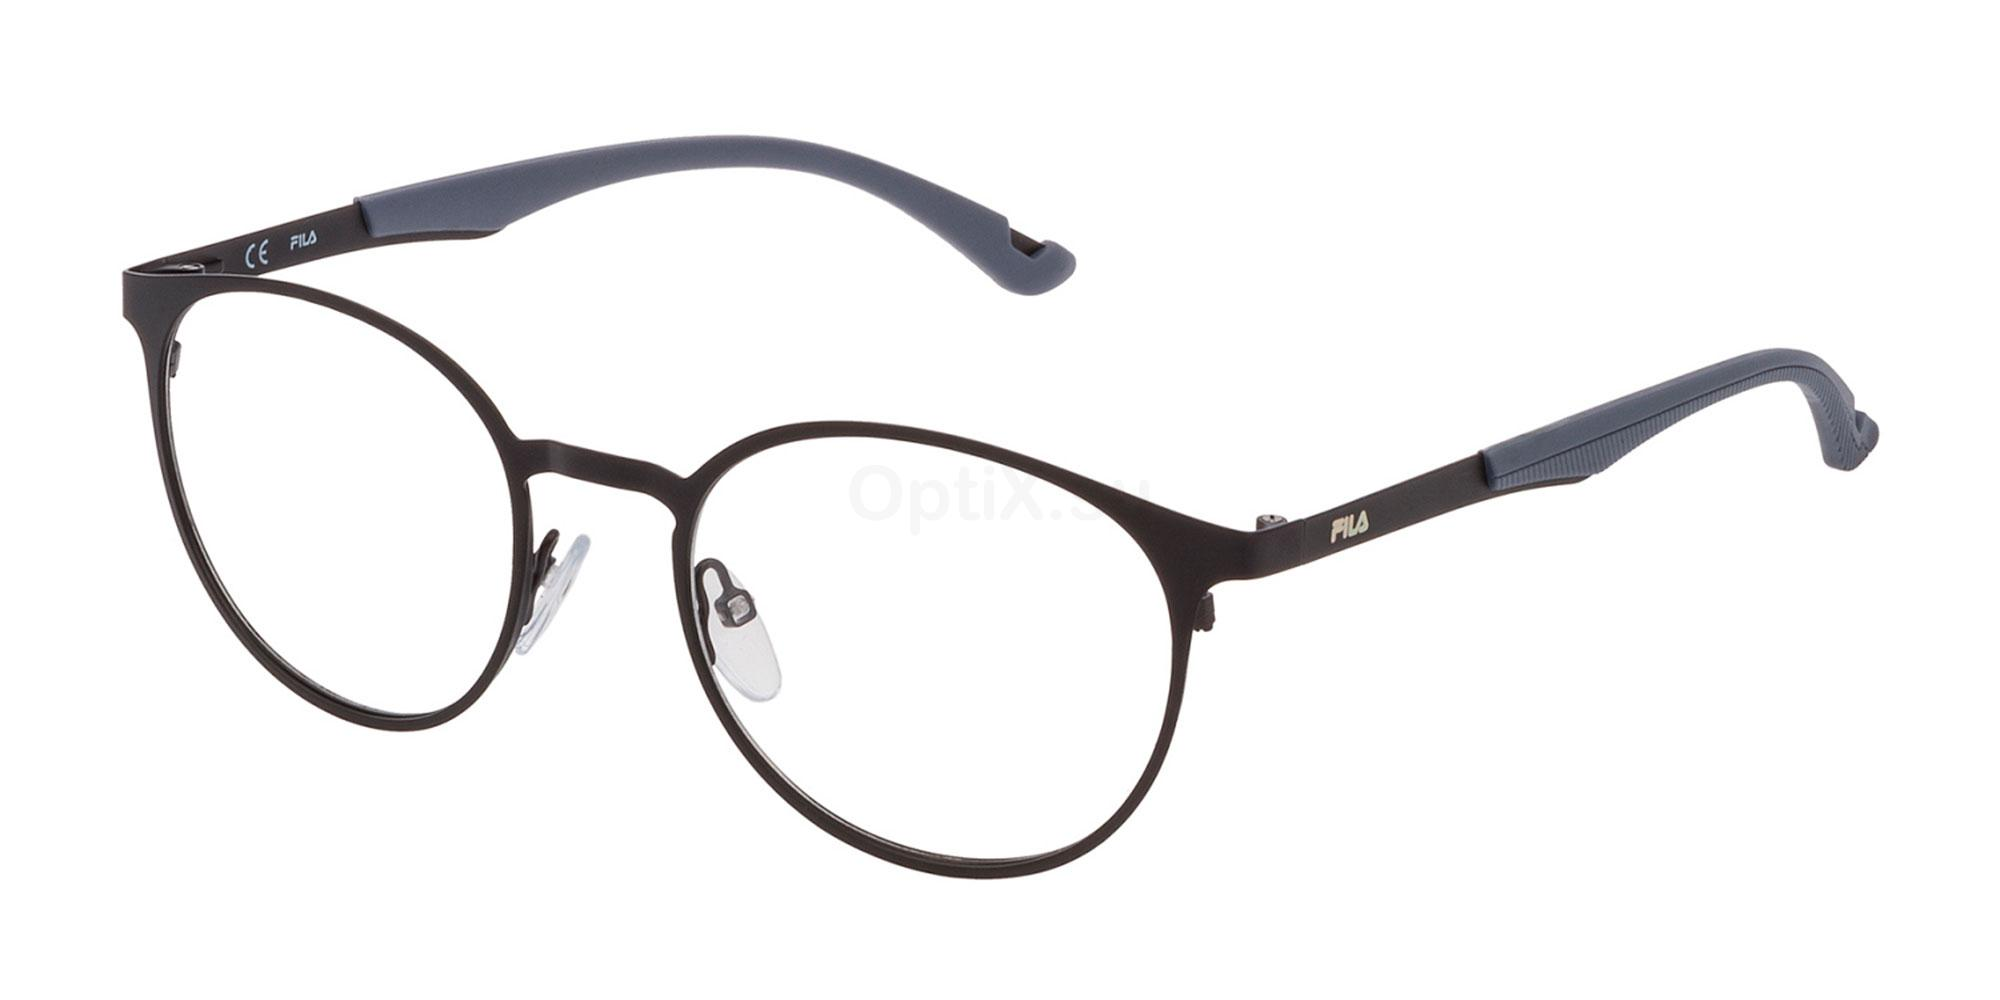 0531 VF9919 Glasses, Fila